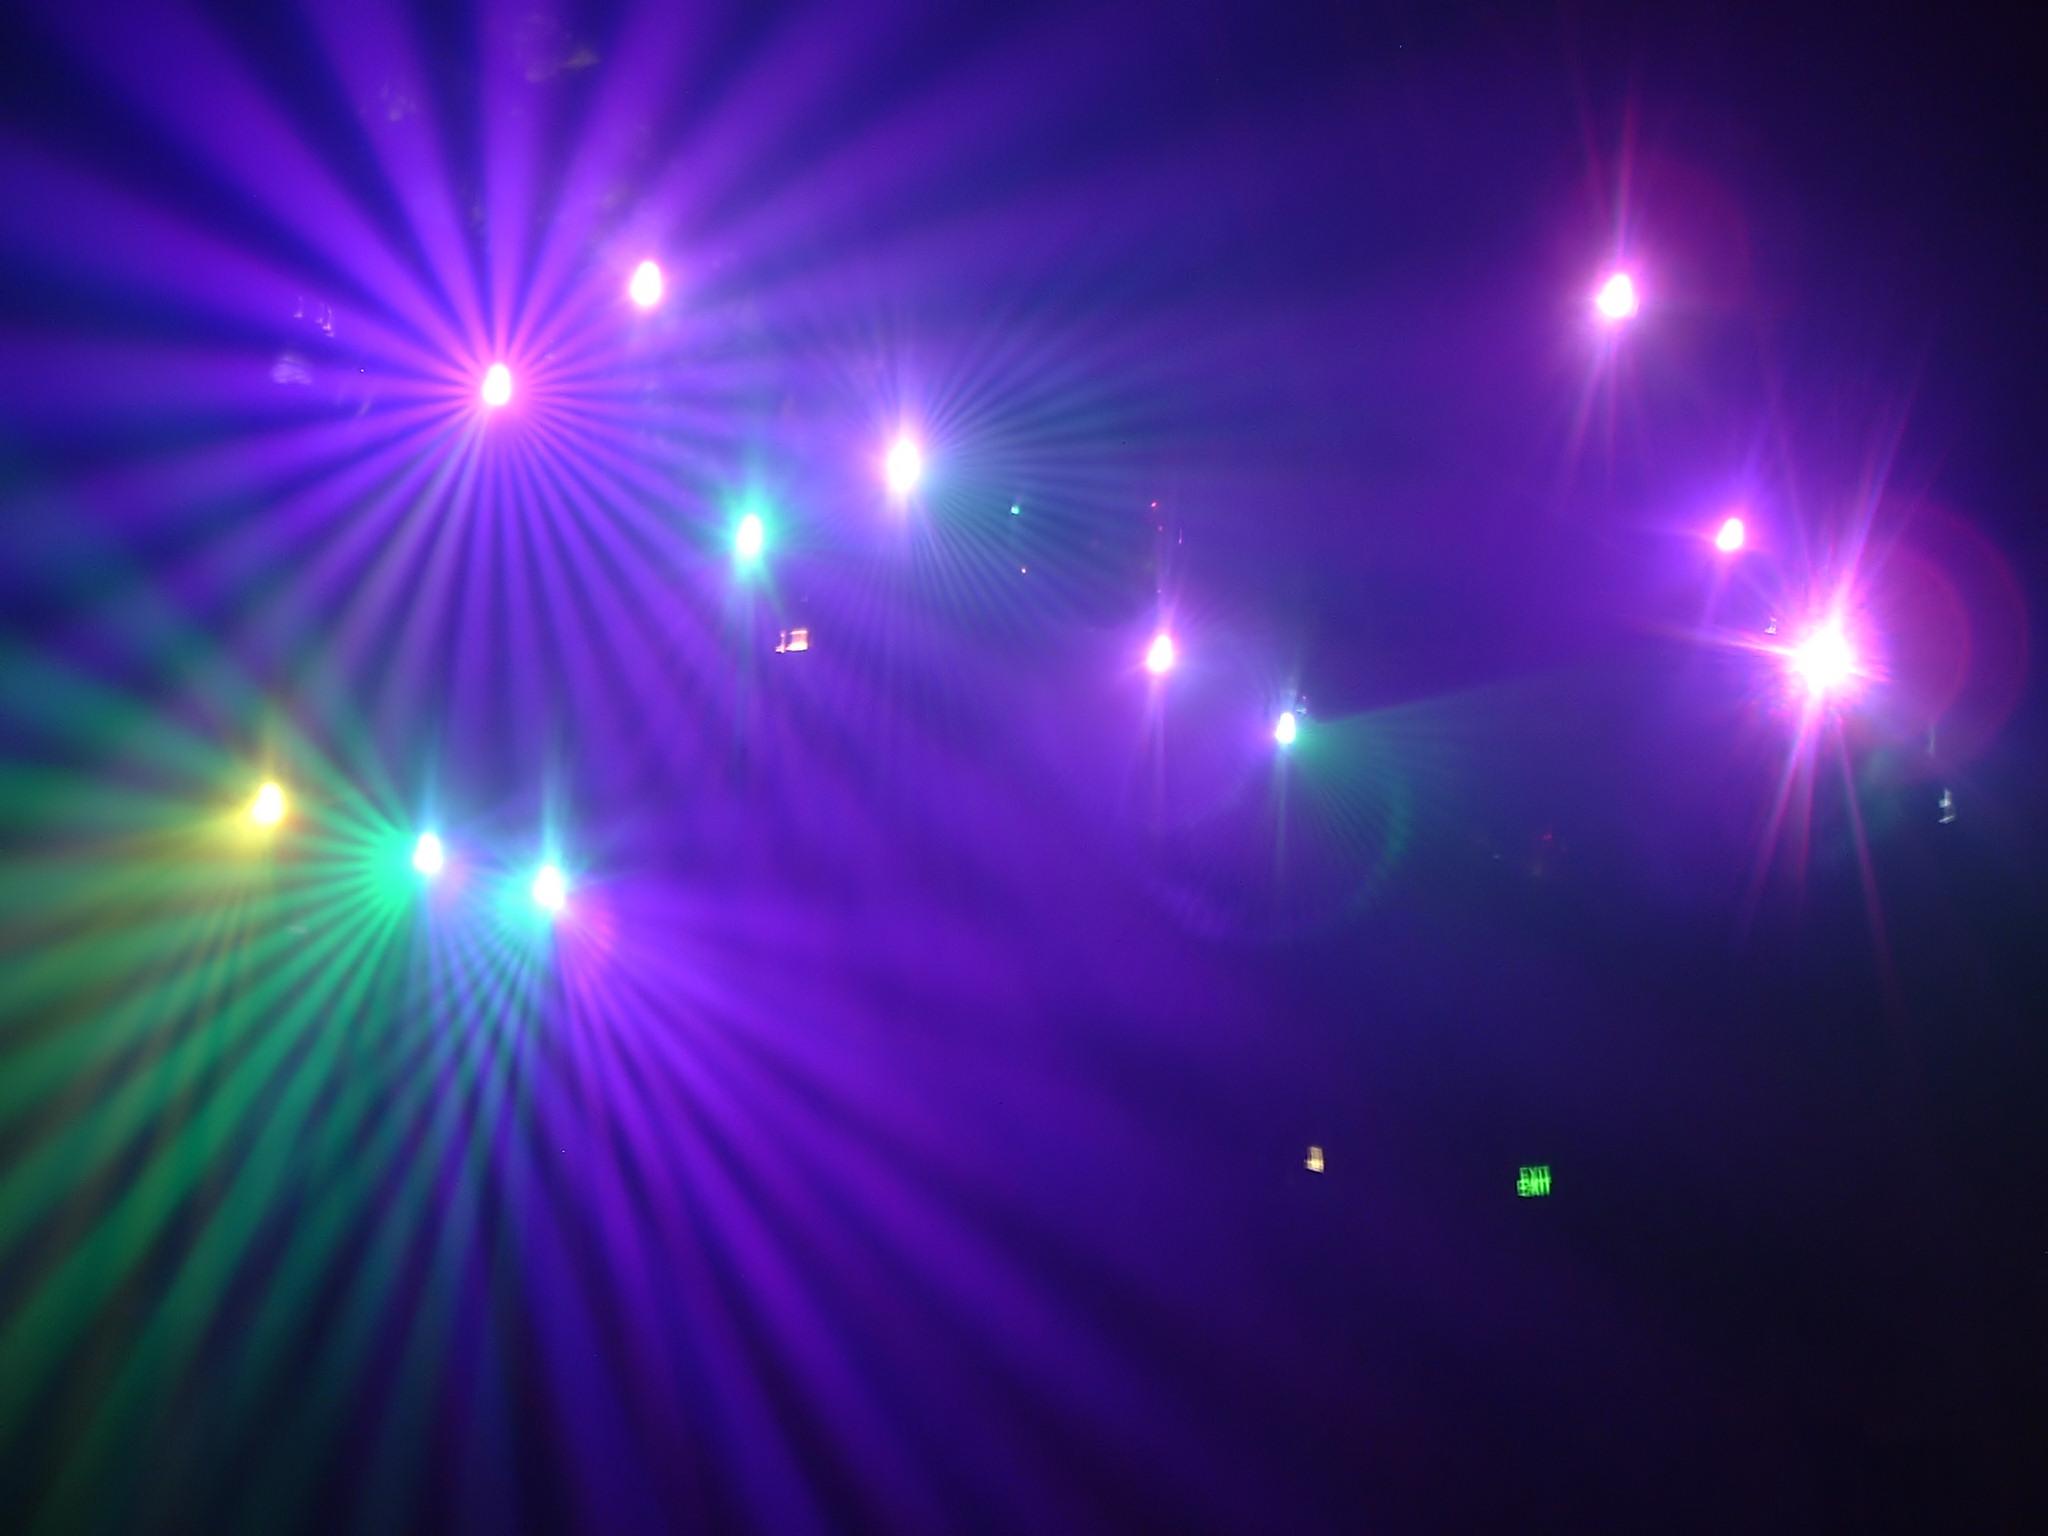 Club lighting rig test by astrant82 on deviantart - Licht nightclub ...